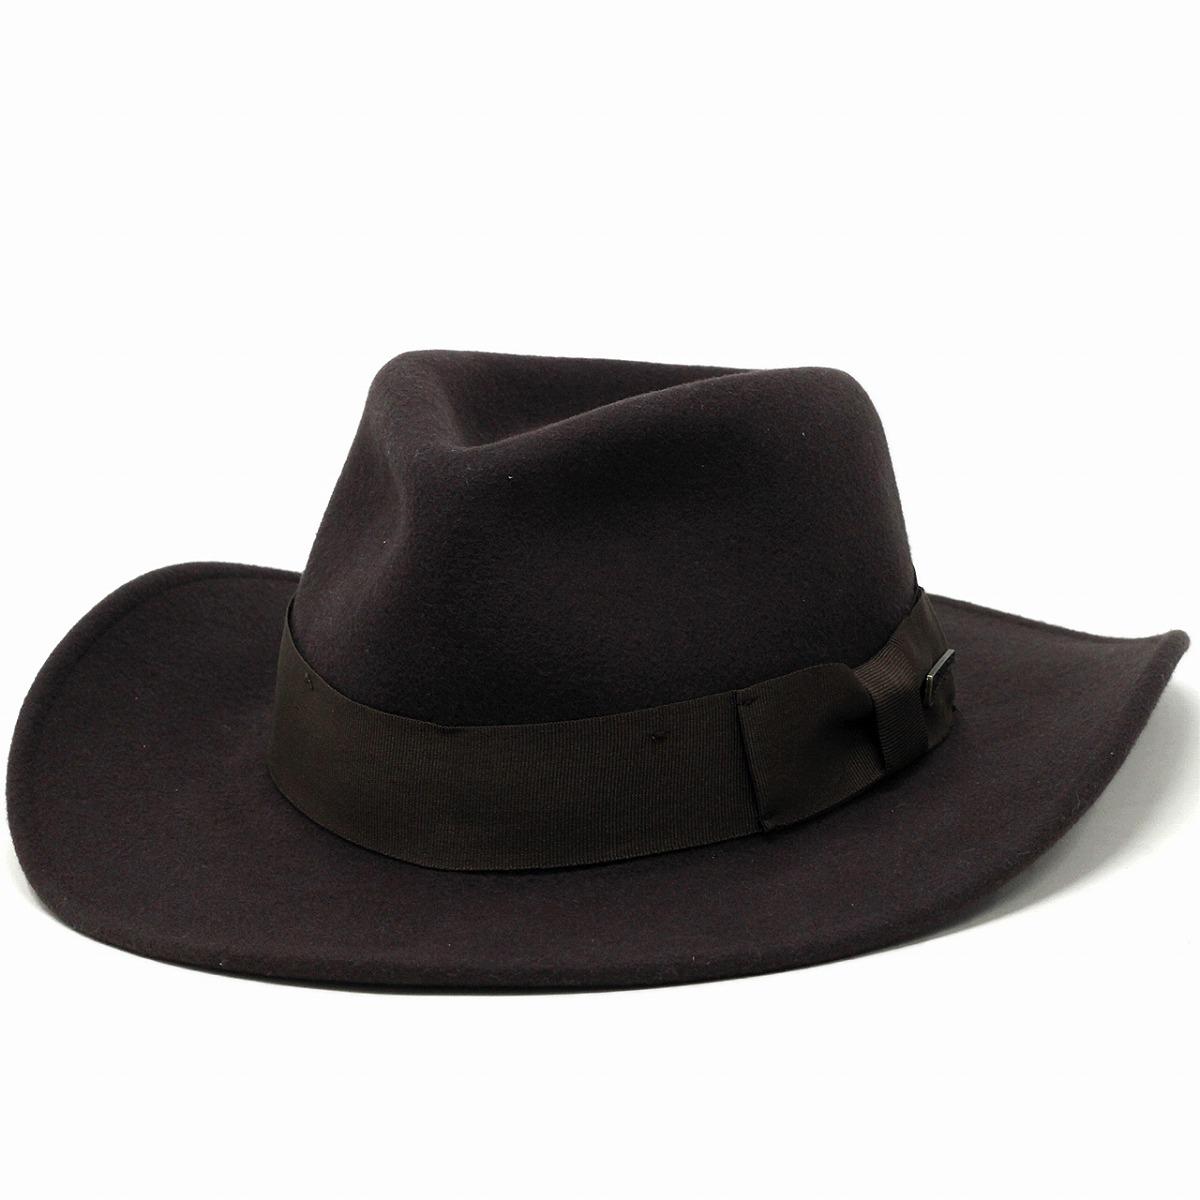 1d57897c153f2 ELEHELM HAT STORE  Indiana Jones Hat wide brim crushable wool felt men s  outback Hat Disney winter   Brown